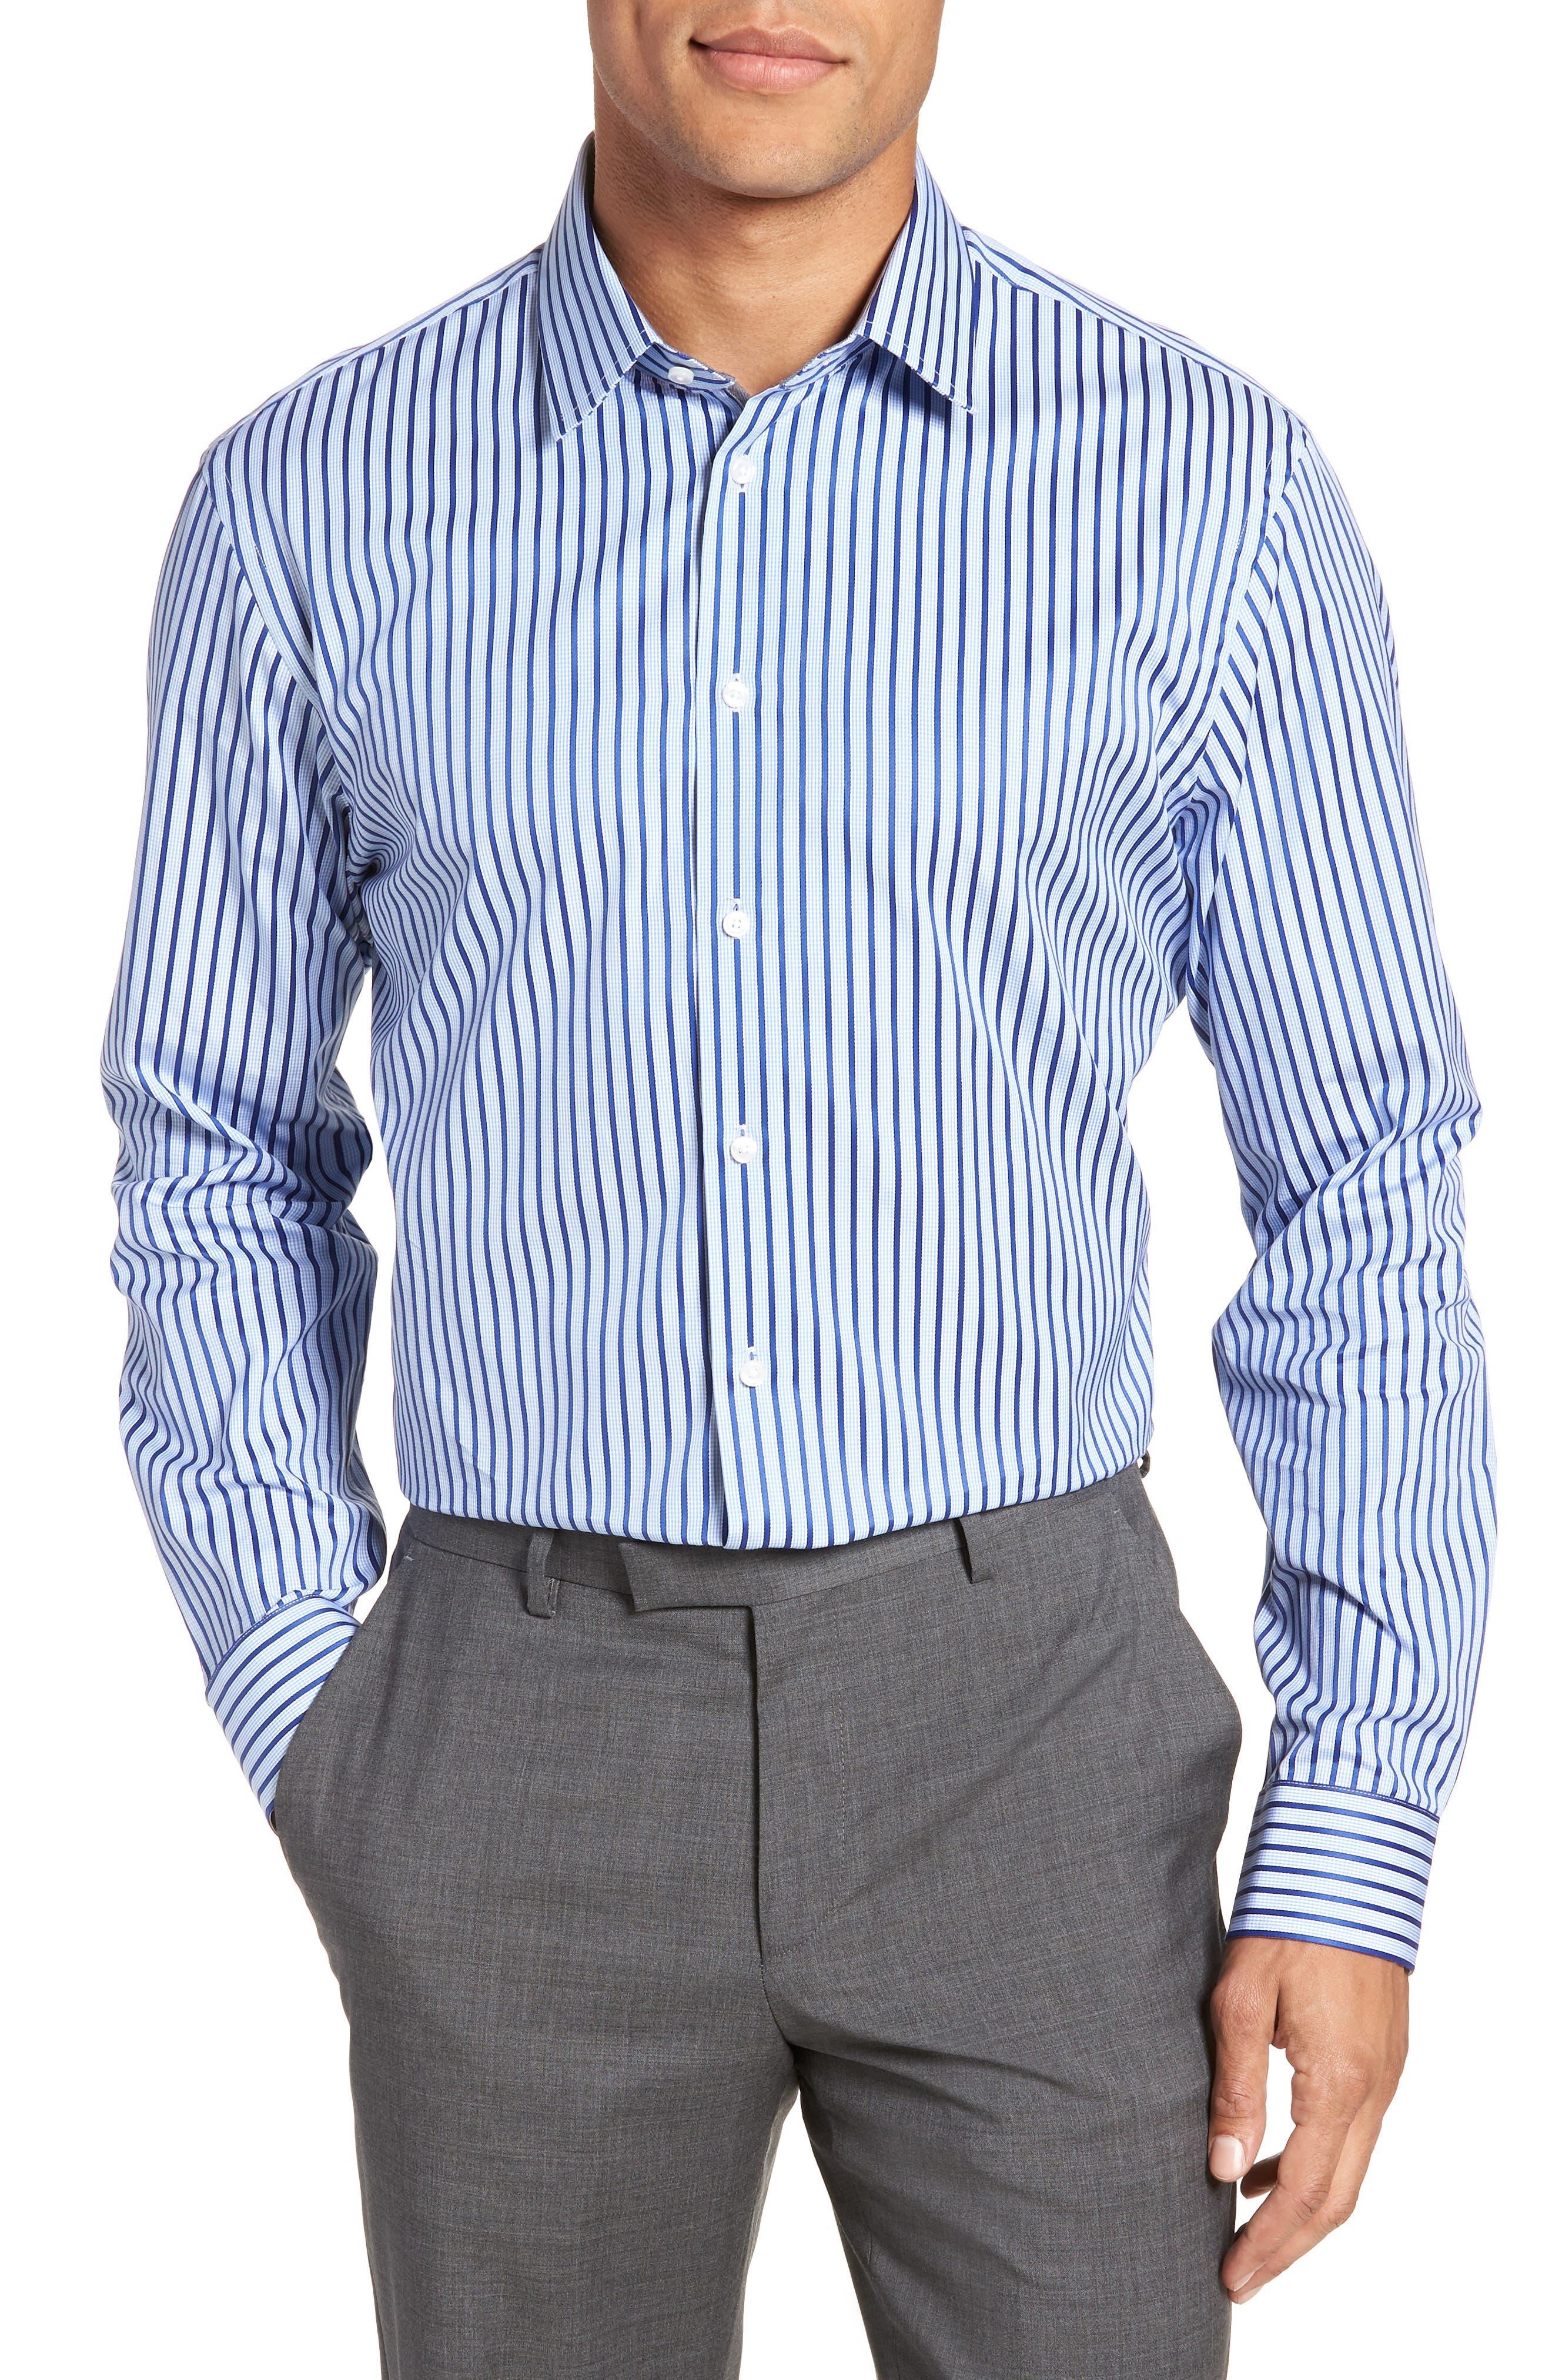 Calibrate Trim Fit Stripe Dress Shirt